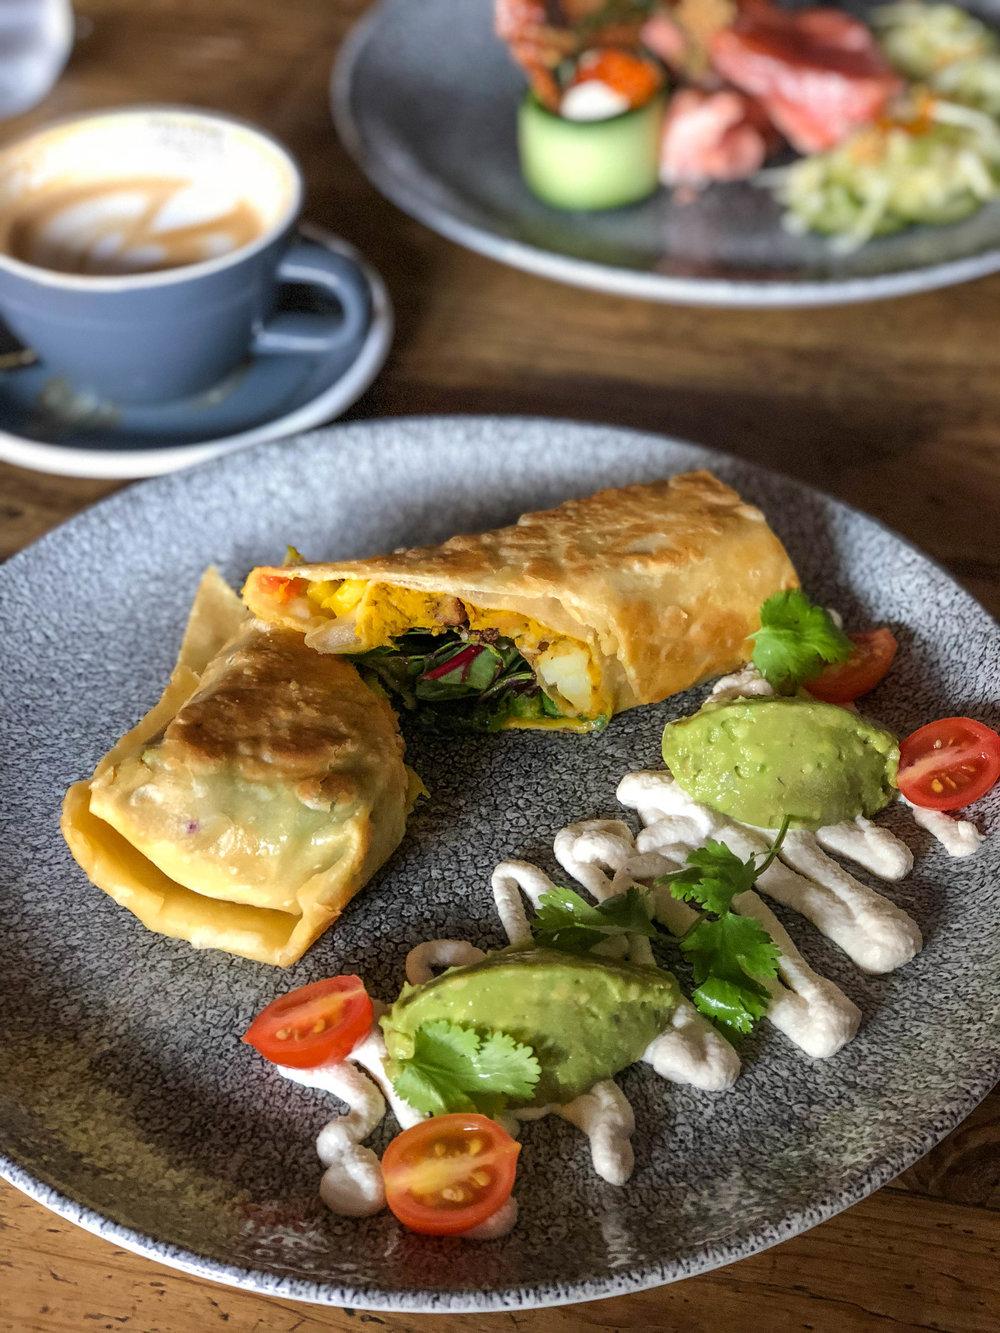 Vegan breakfast burrito with sweet potatoes, mango salsa, and black beans